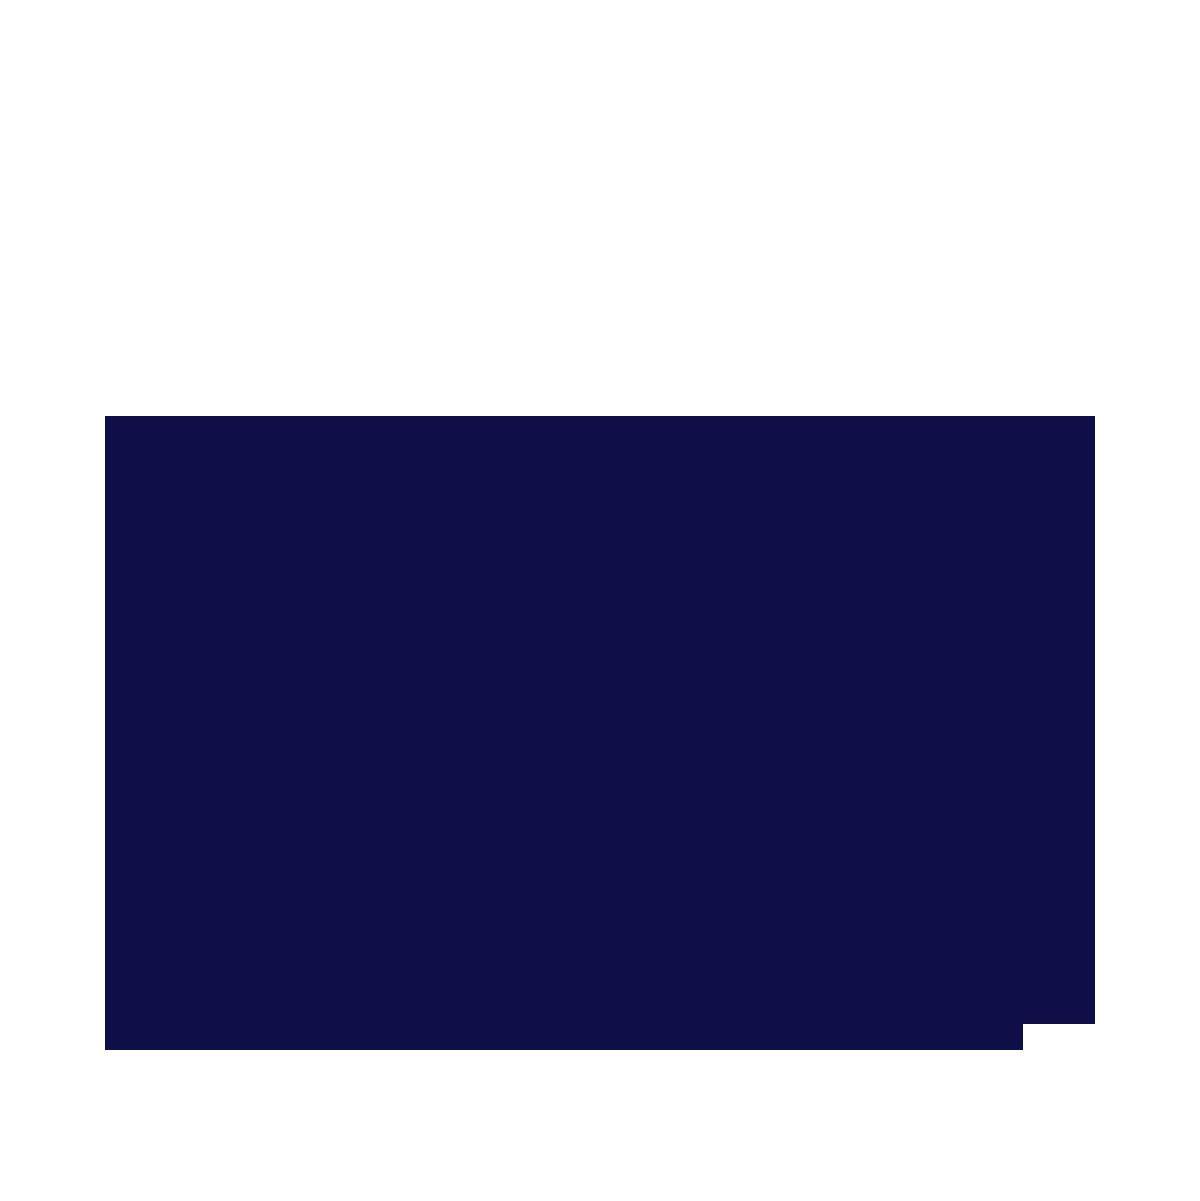 Roedean-Landscape-Logo-02 Blue.png